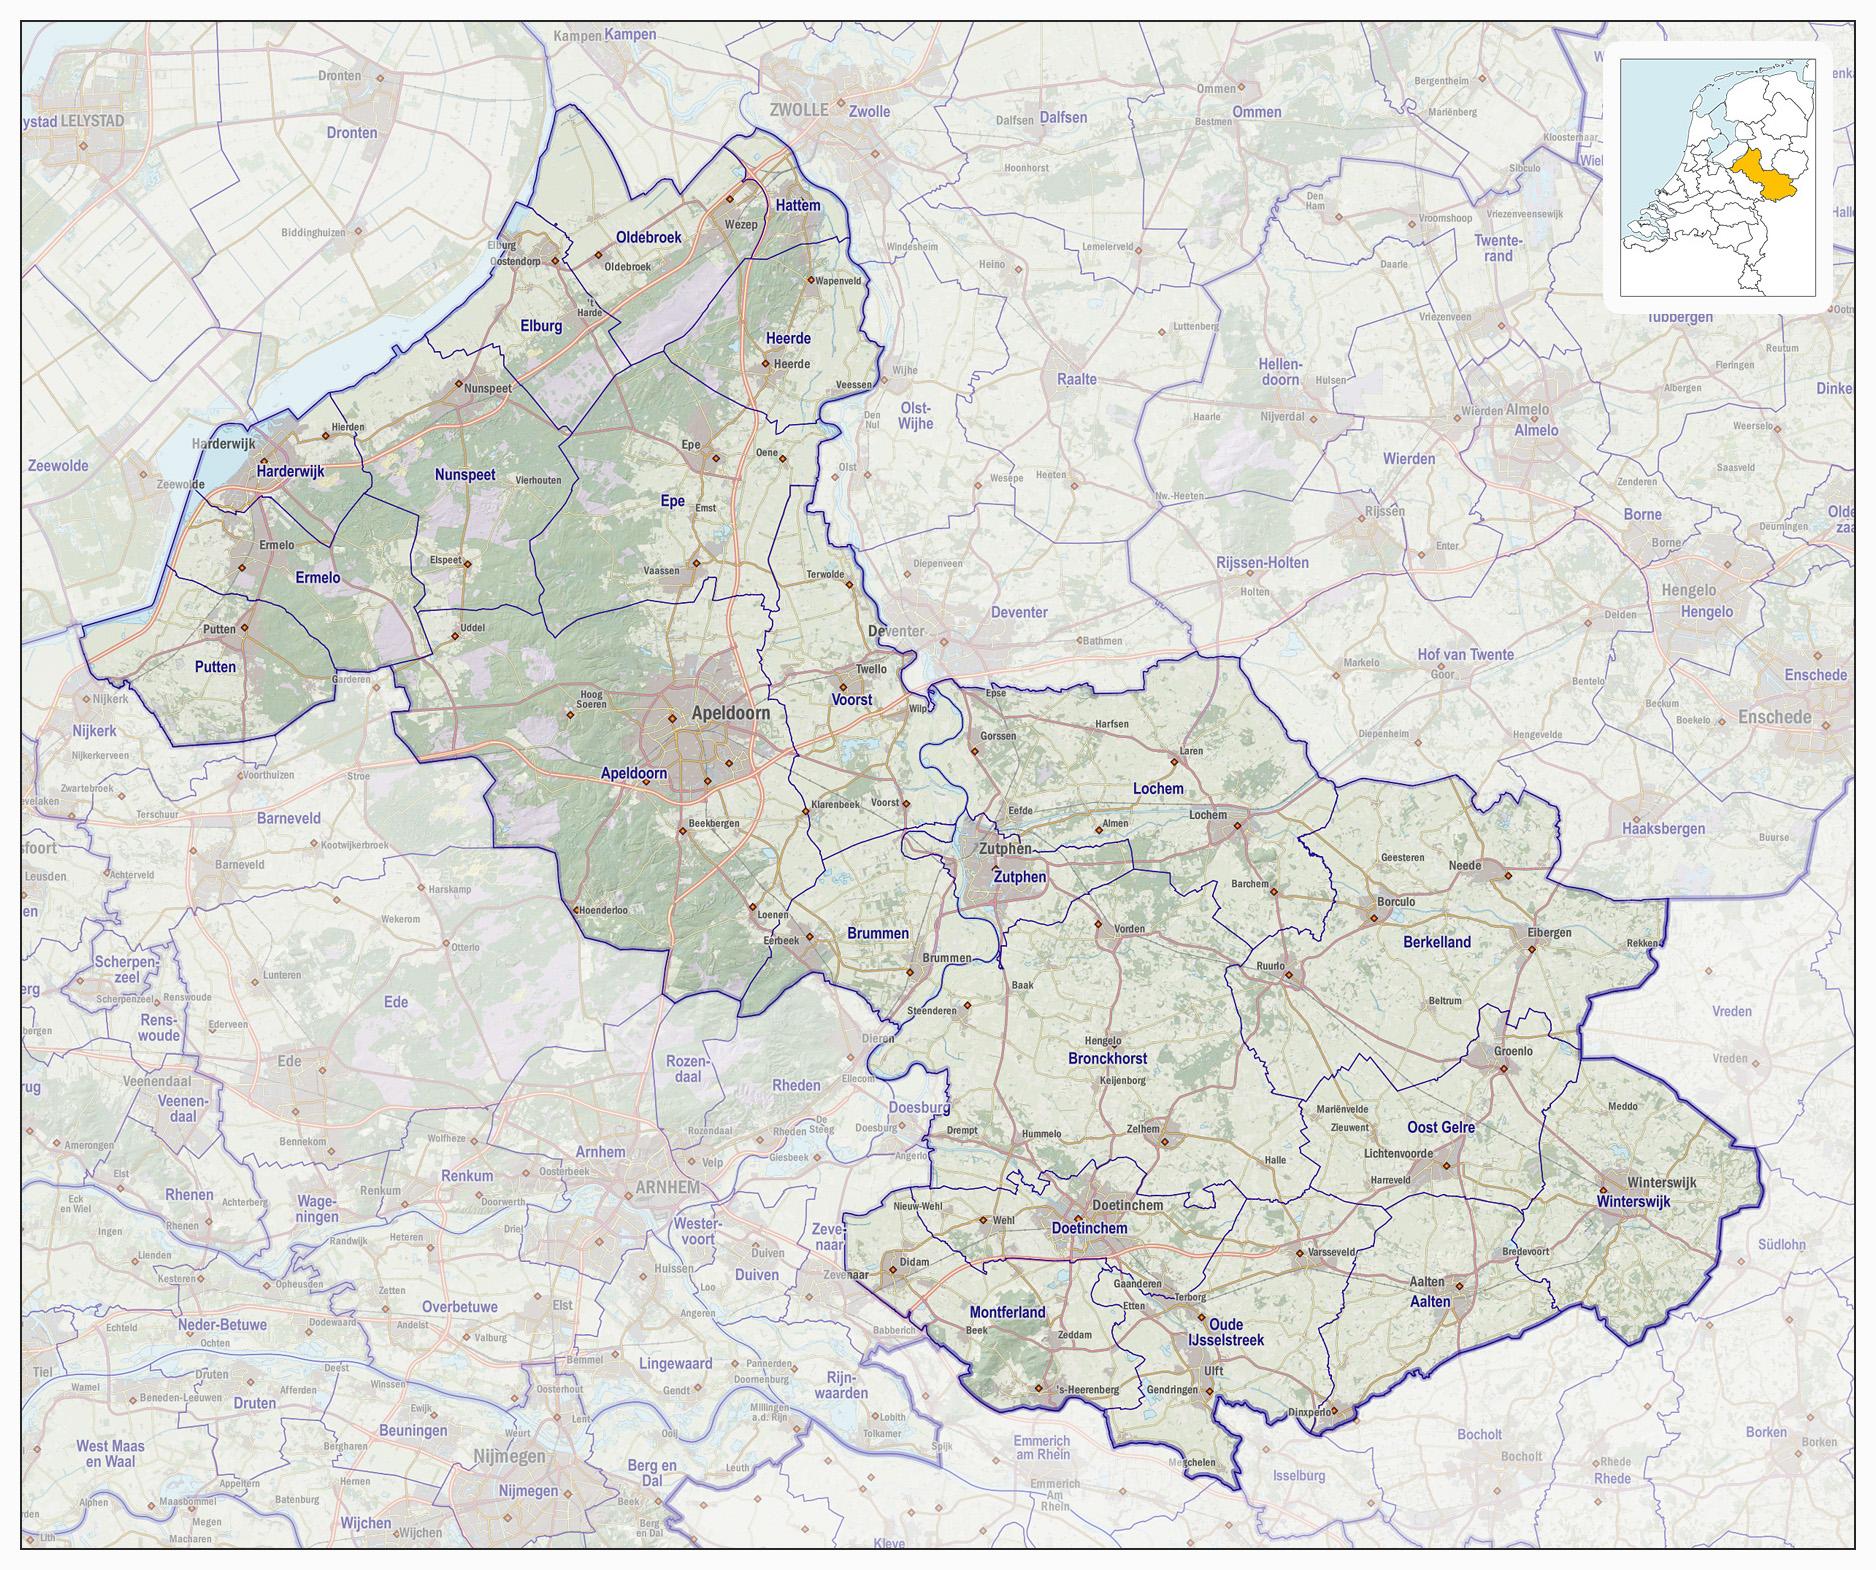 Veiligheidsregio Noord En Oost Gelderland Wikipedia